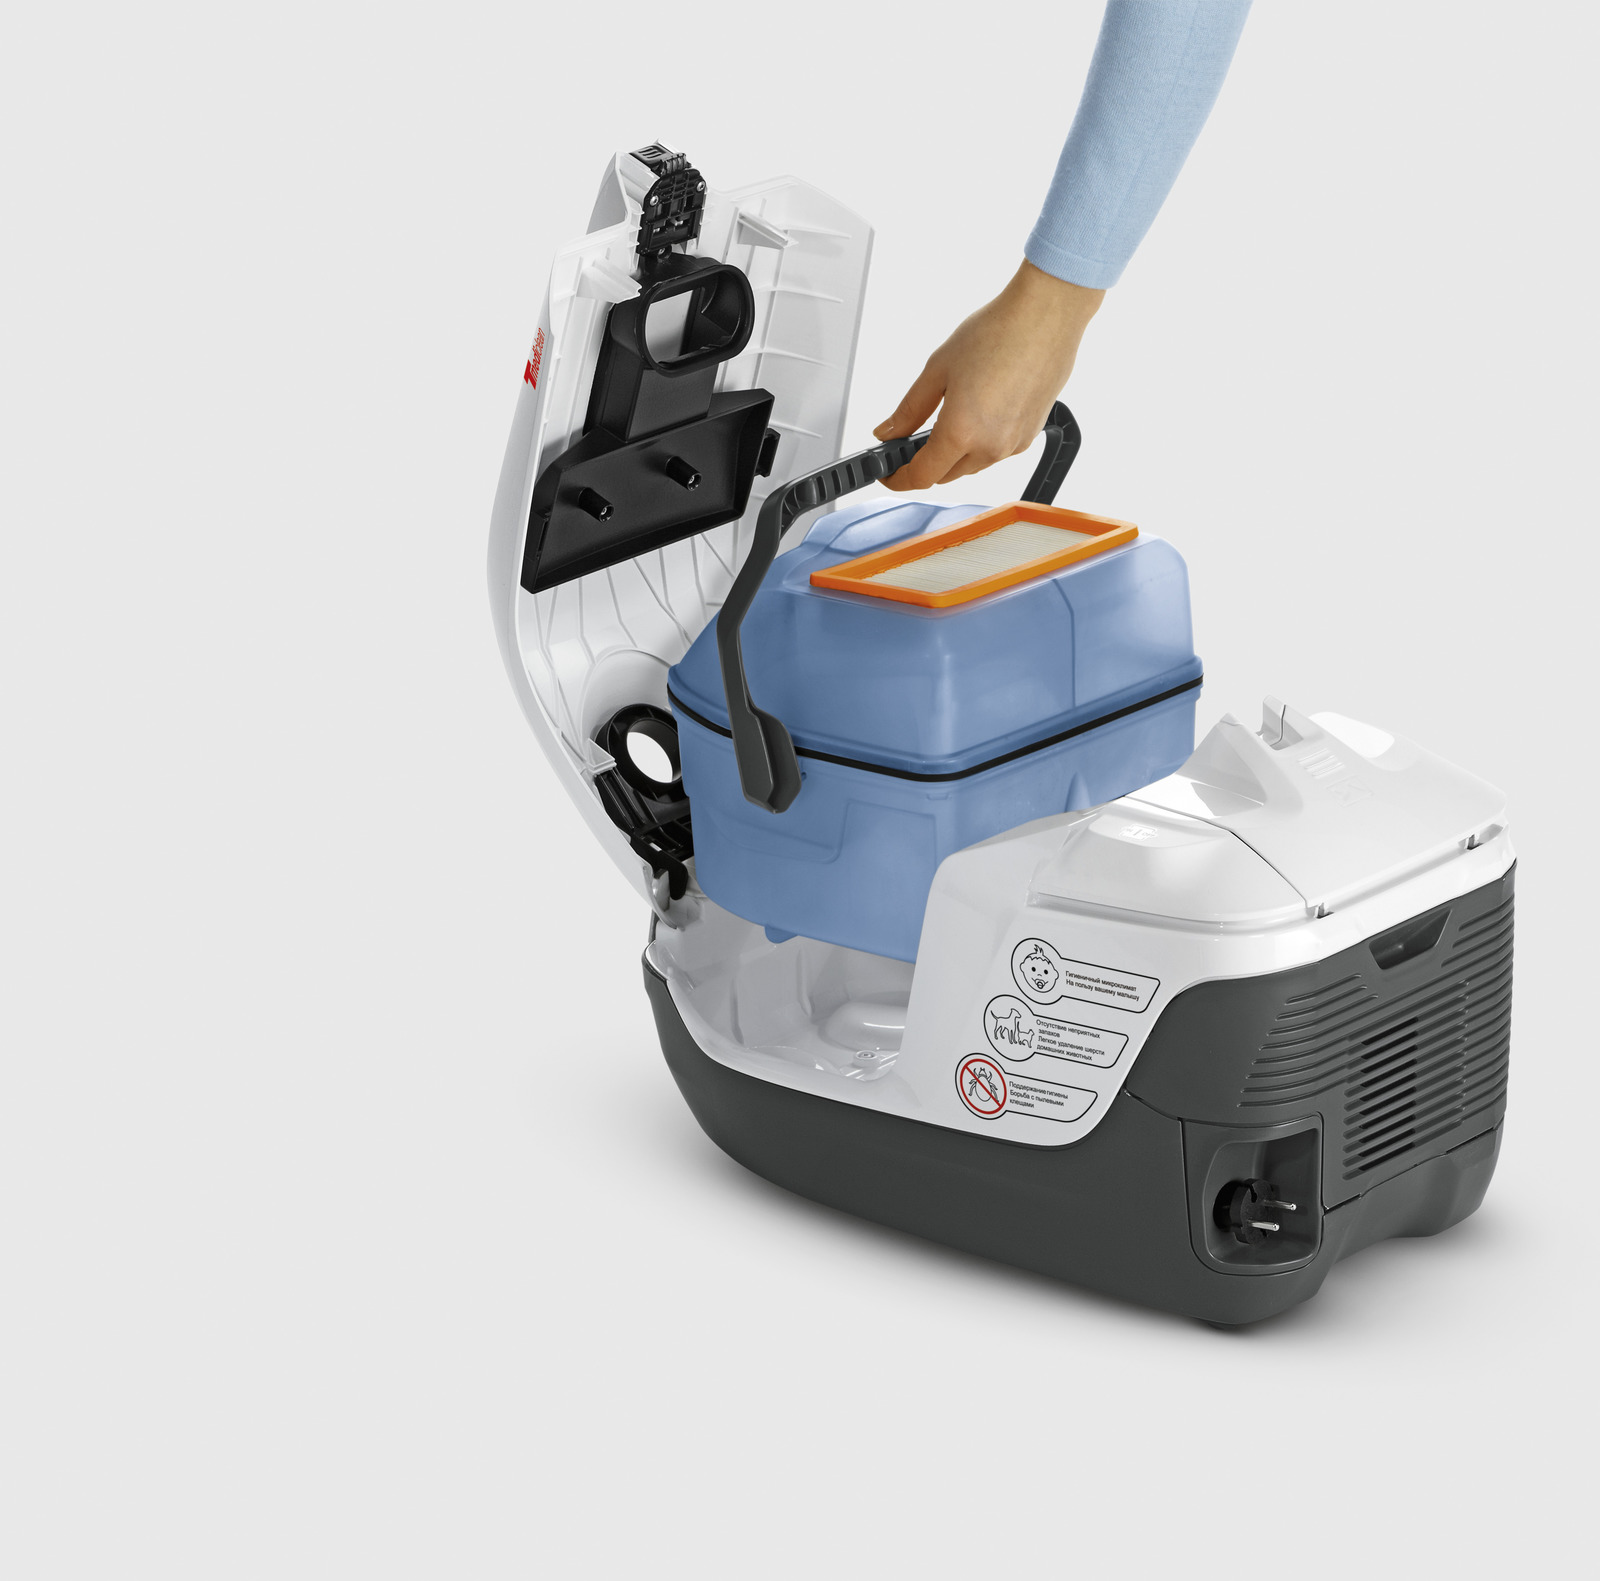 Karcher ds 5600 mediclean инструкция